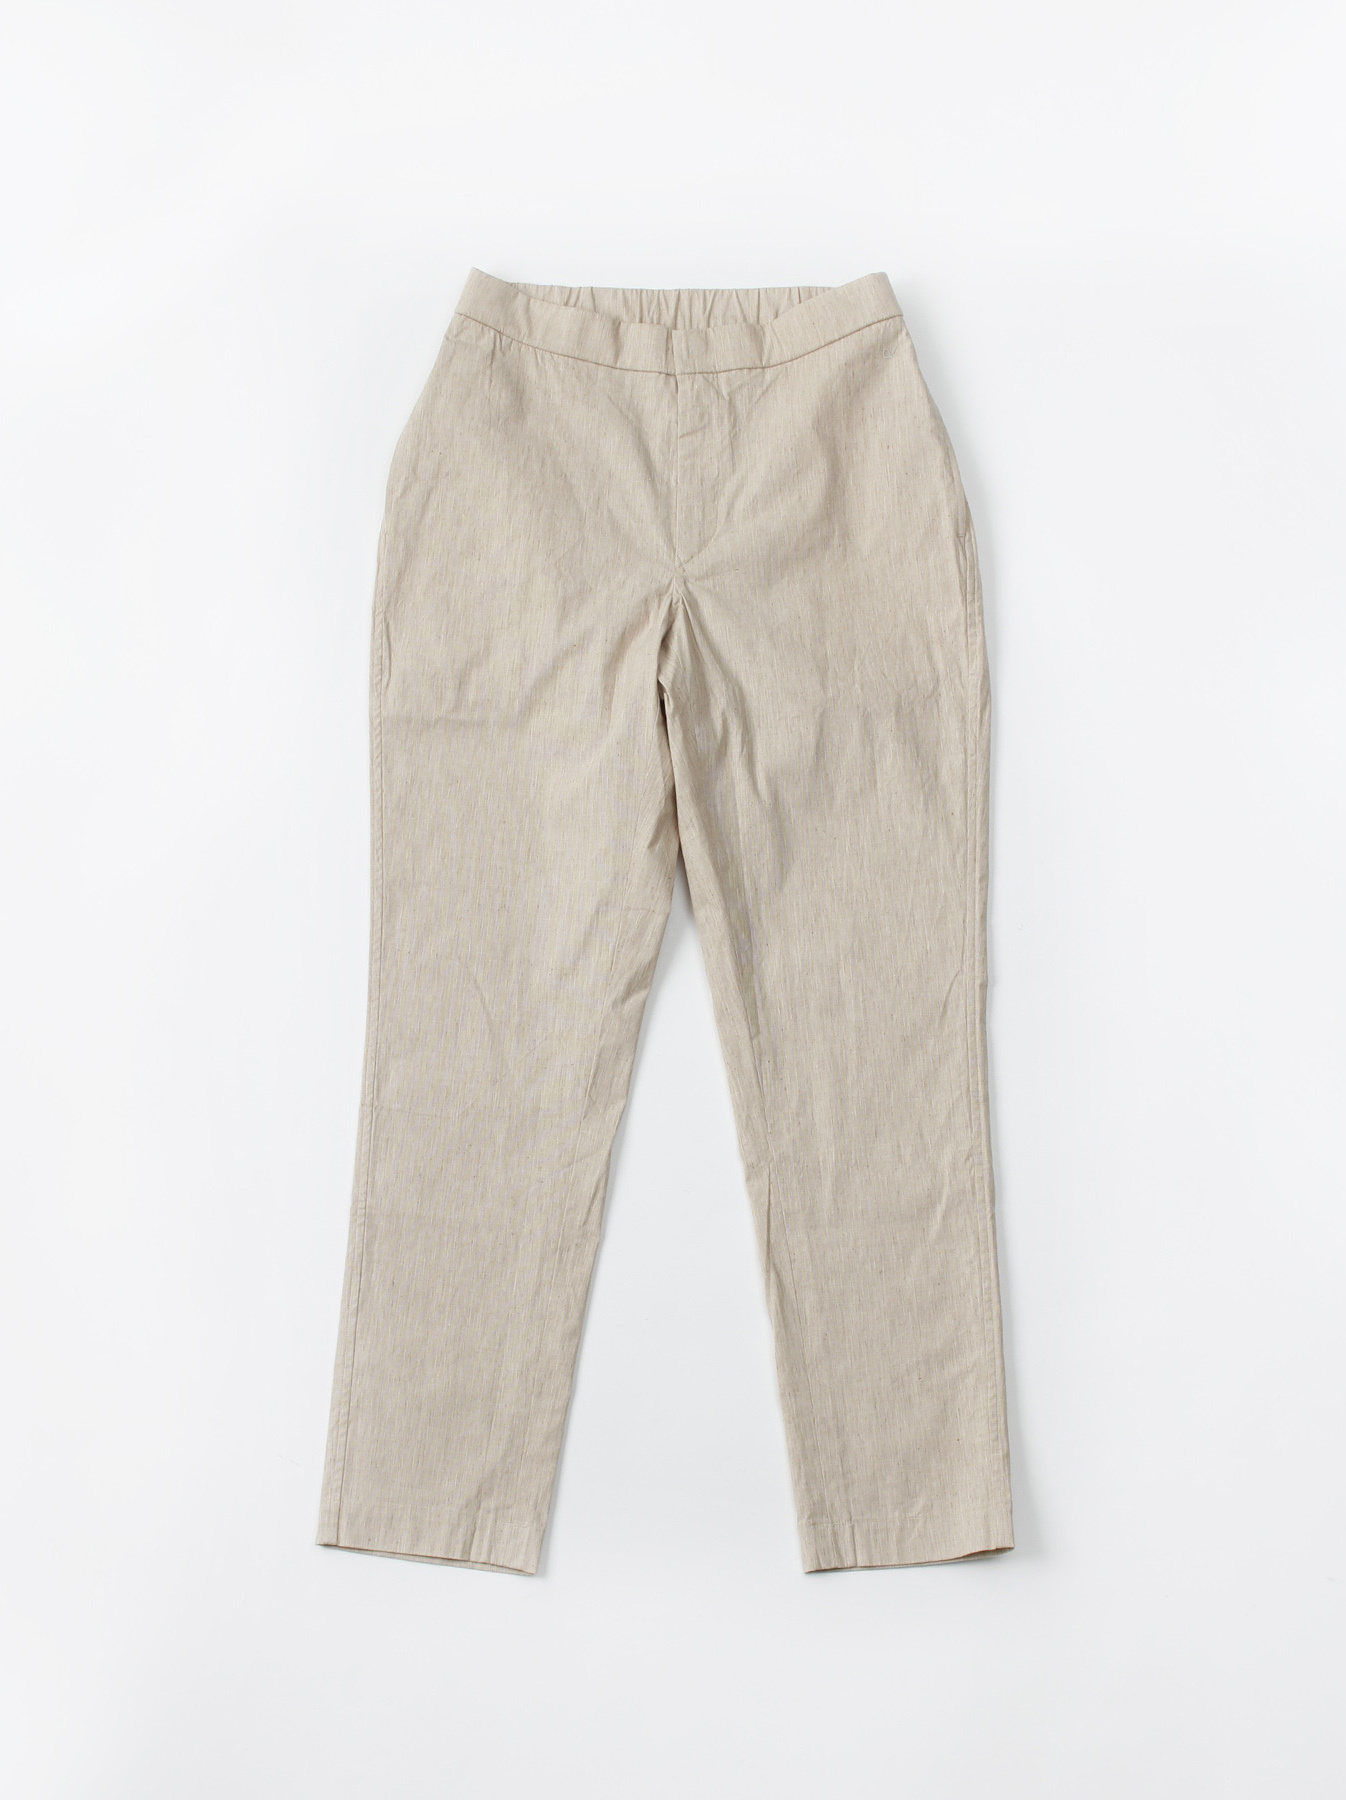 WH Cotton Linen Hakeme Stretch Pants-1